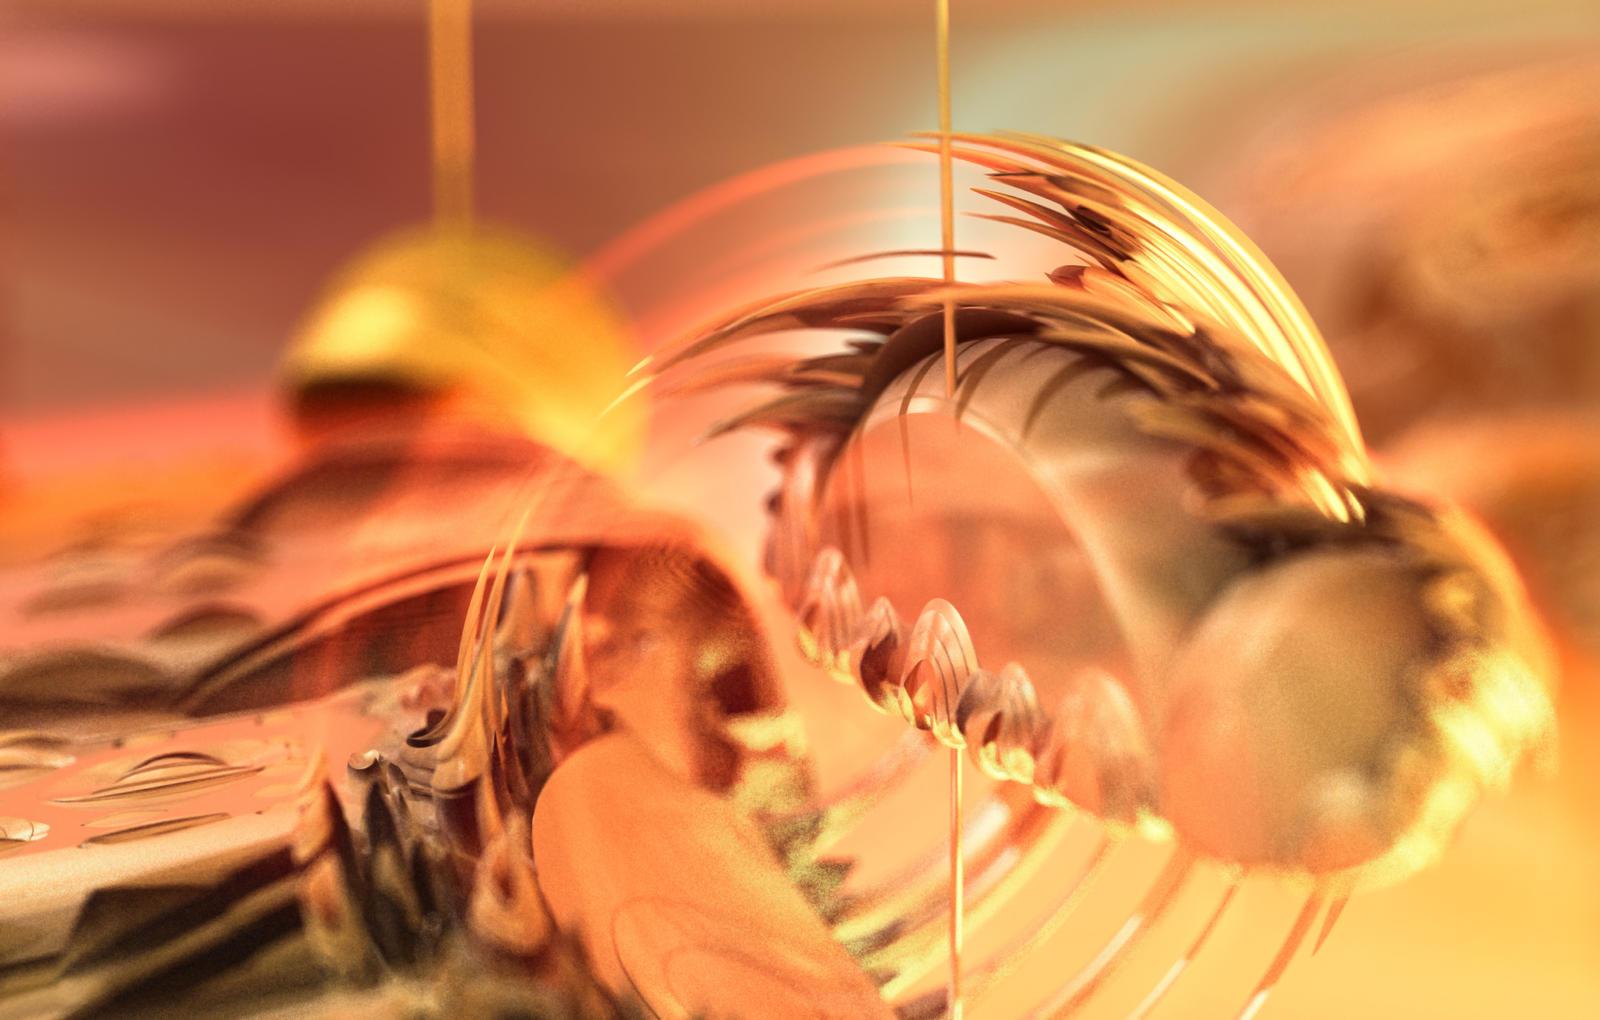 Shiny bug transfixed by entomological pin by mic-art